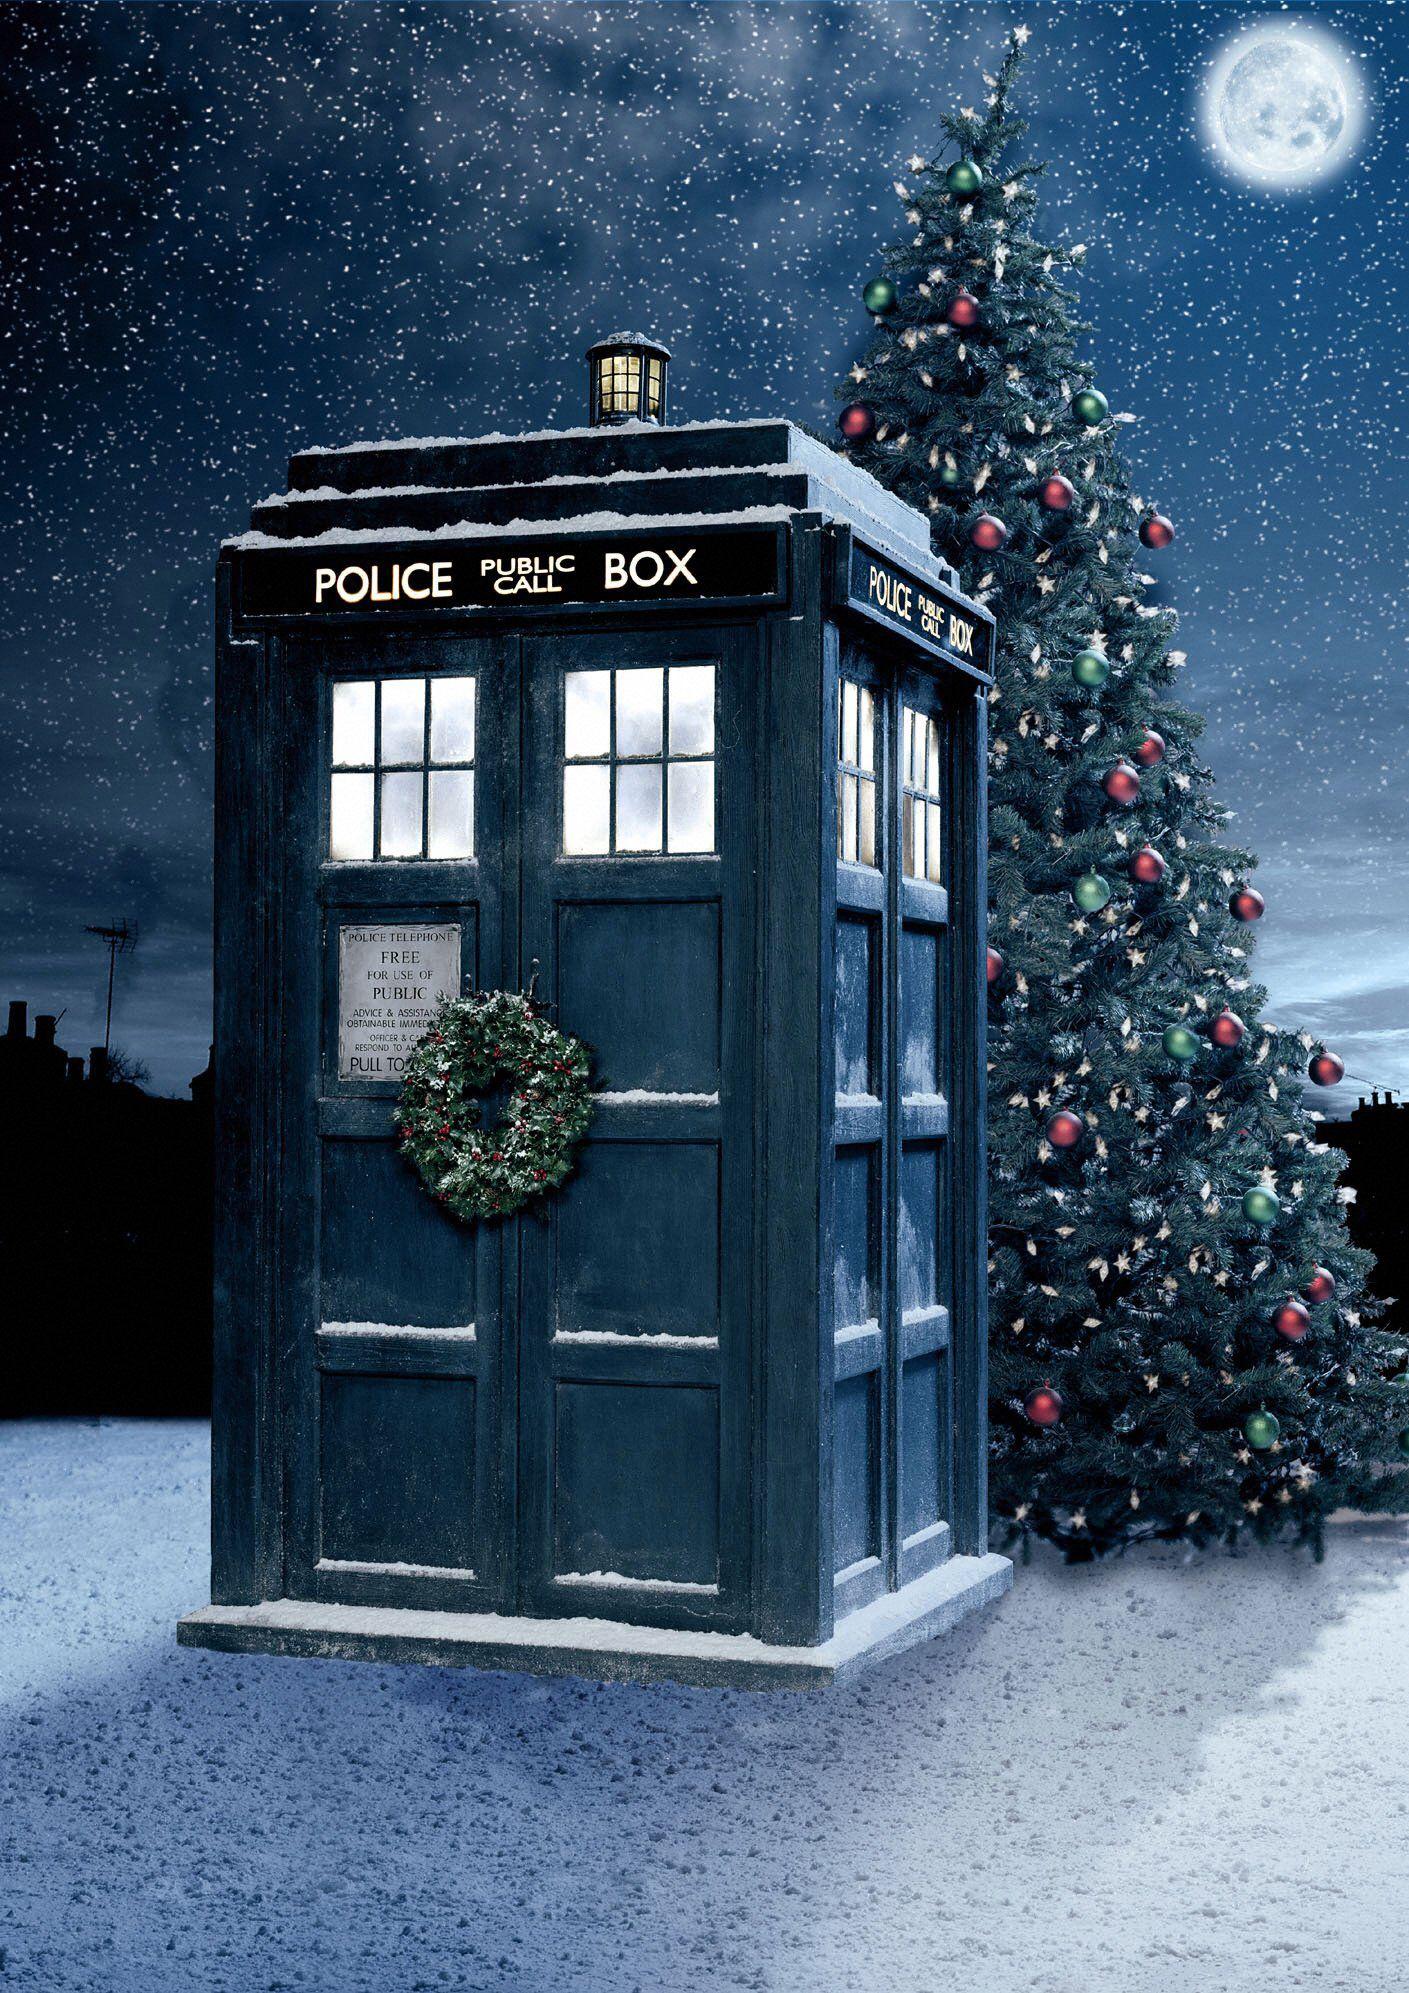 Police call box Xmas Christmas Pinterest